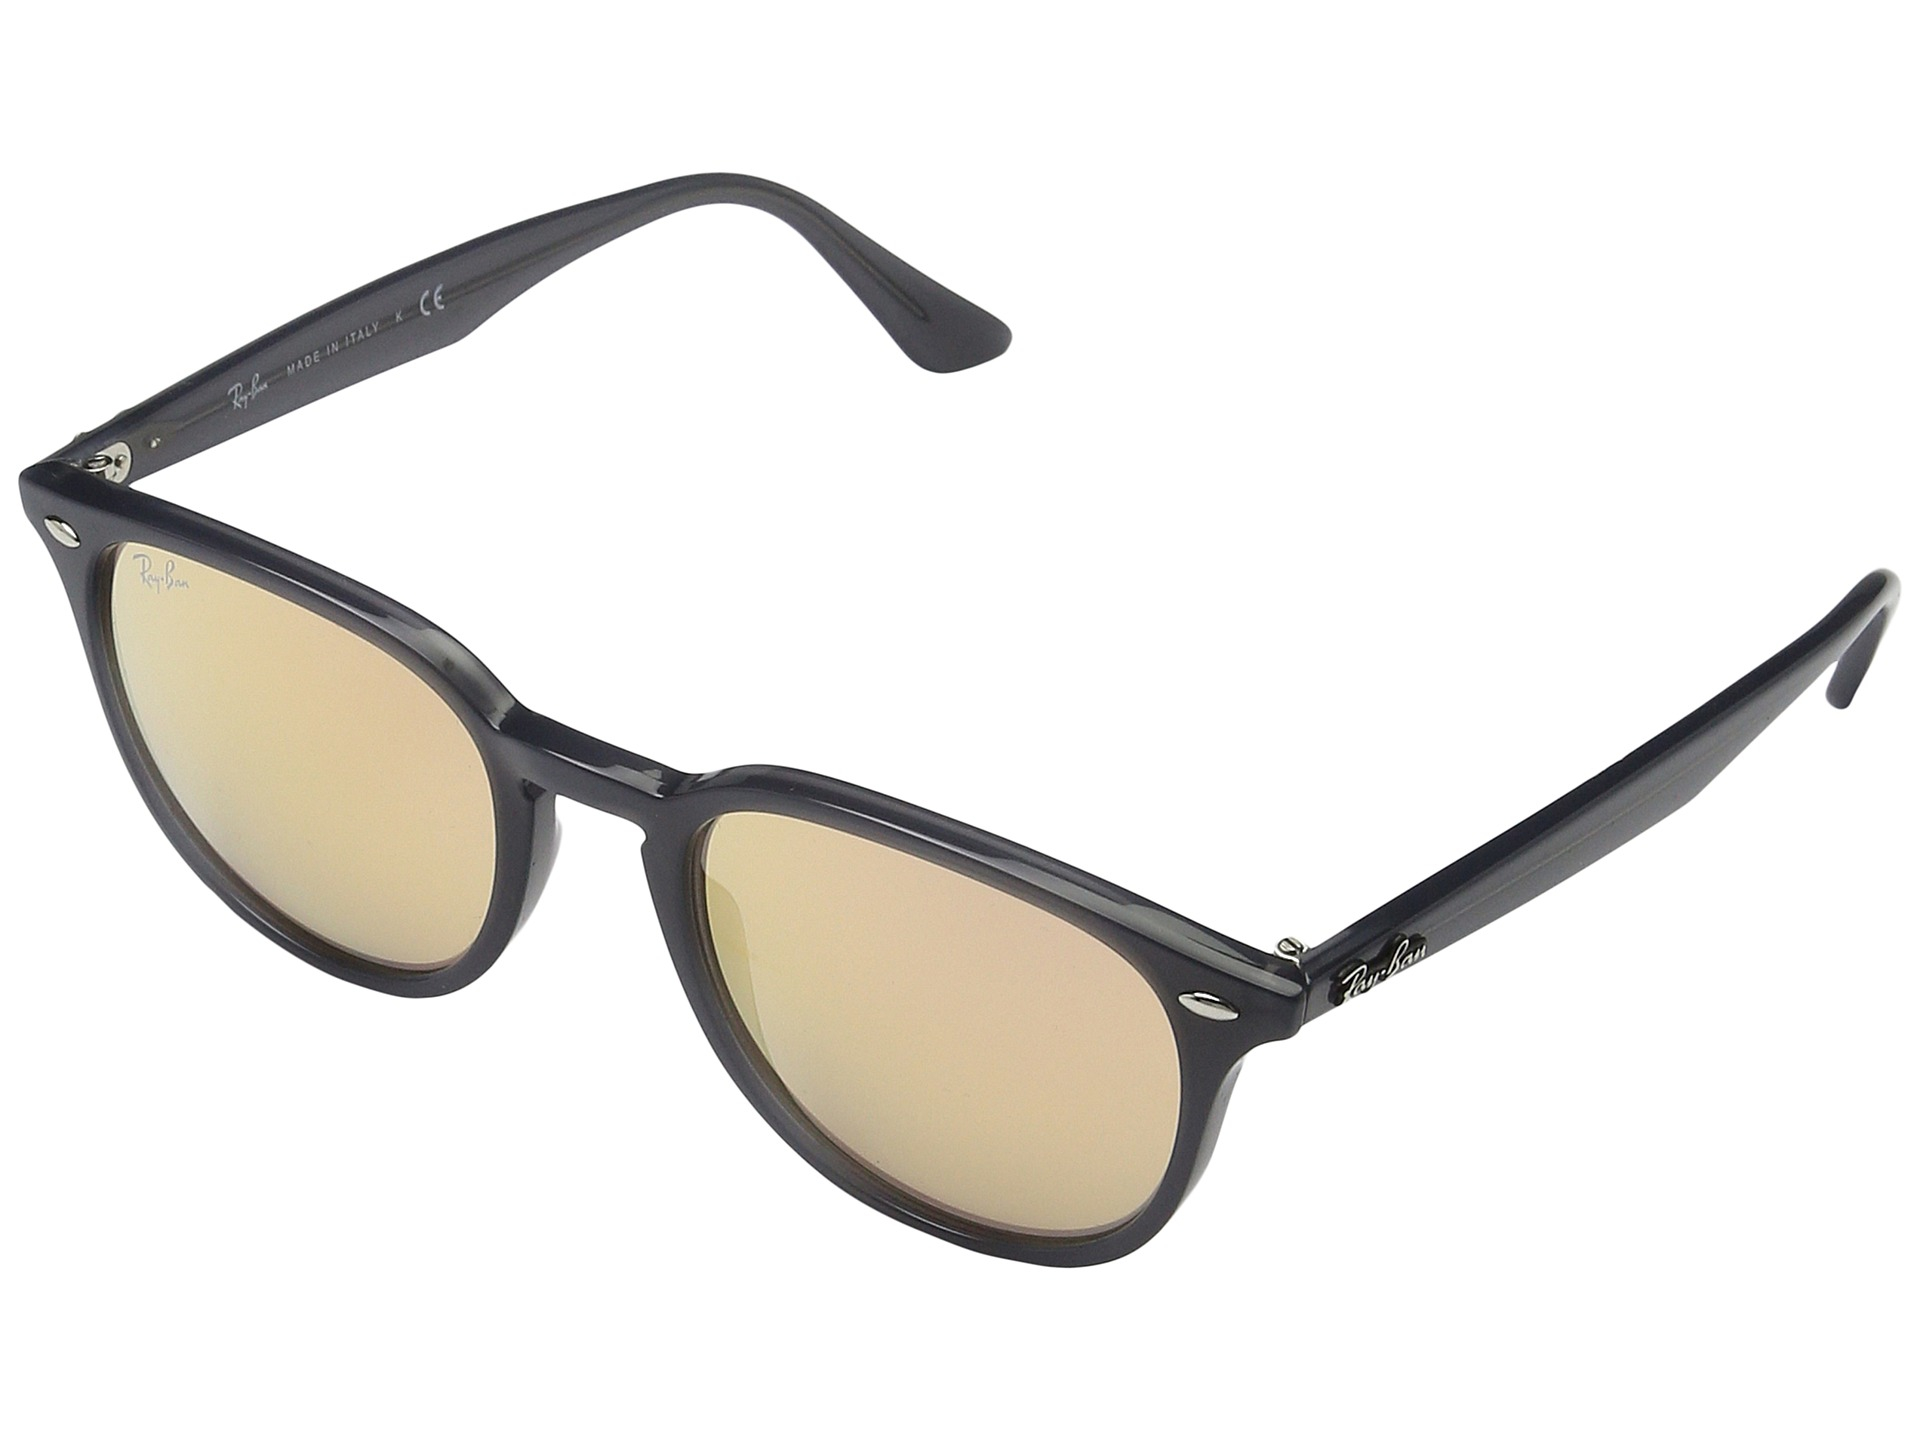 f114162403 Ray Ban Sunglasses Tj Maxx « Heritage Malta